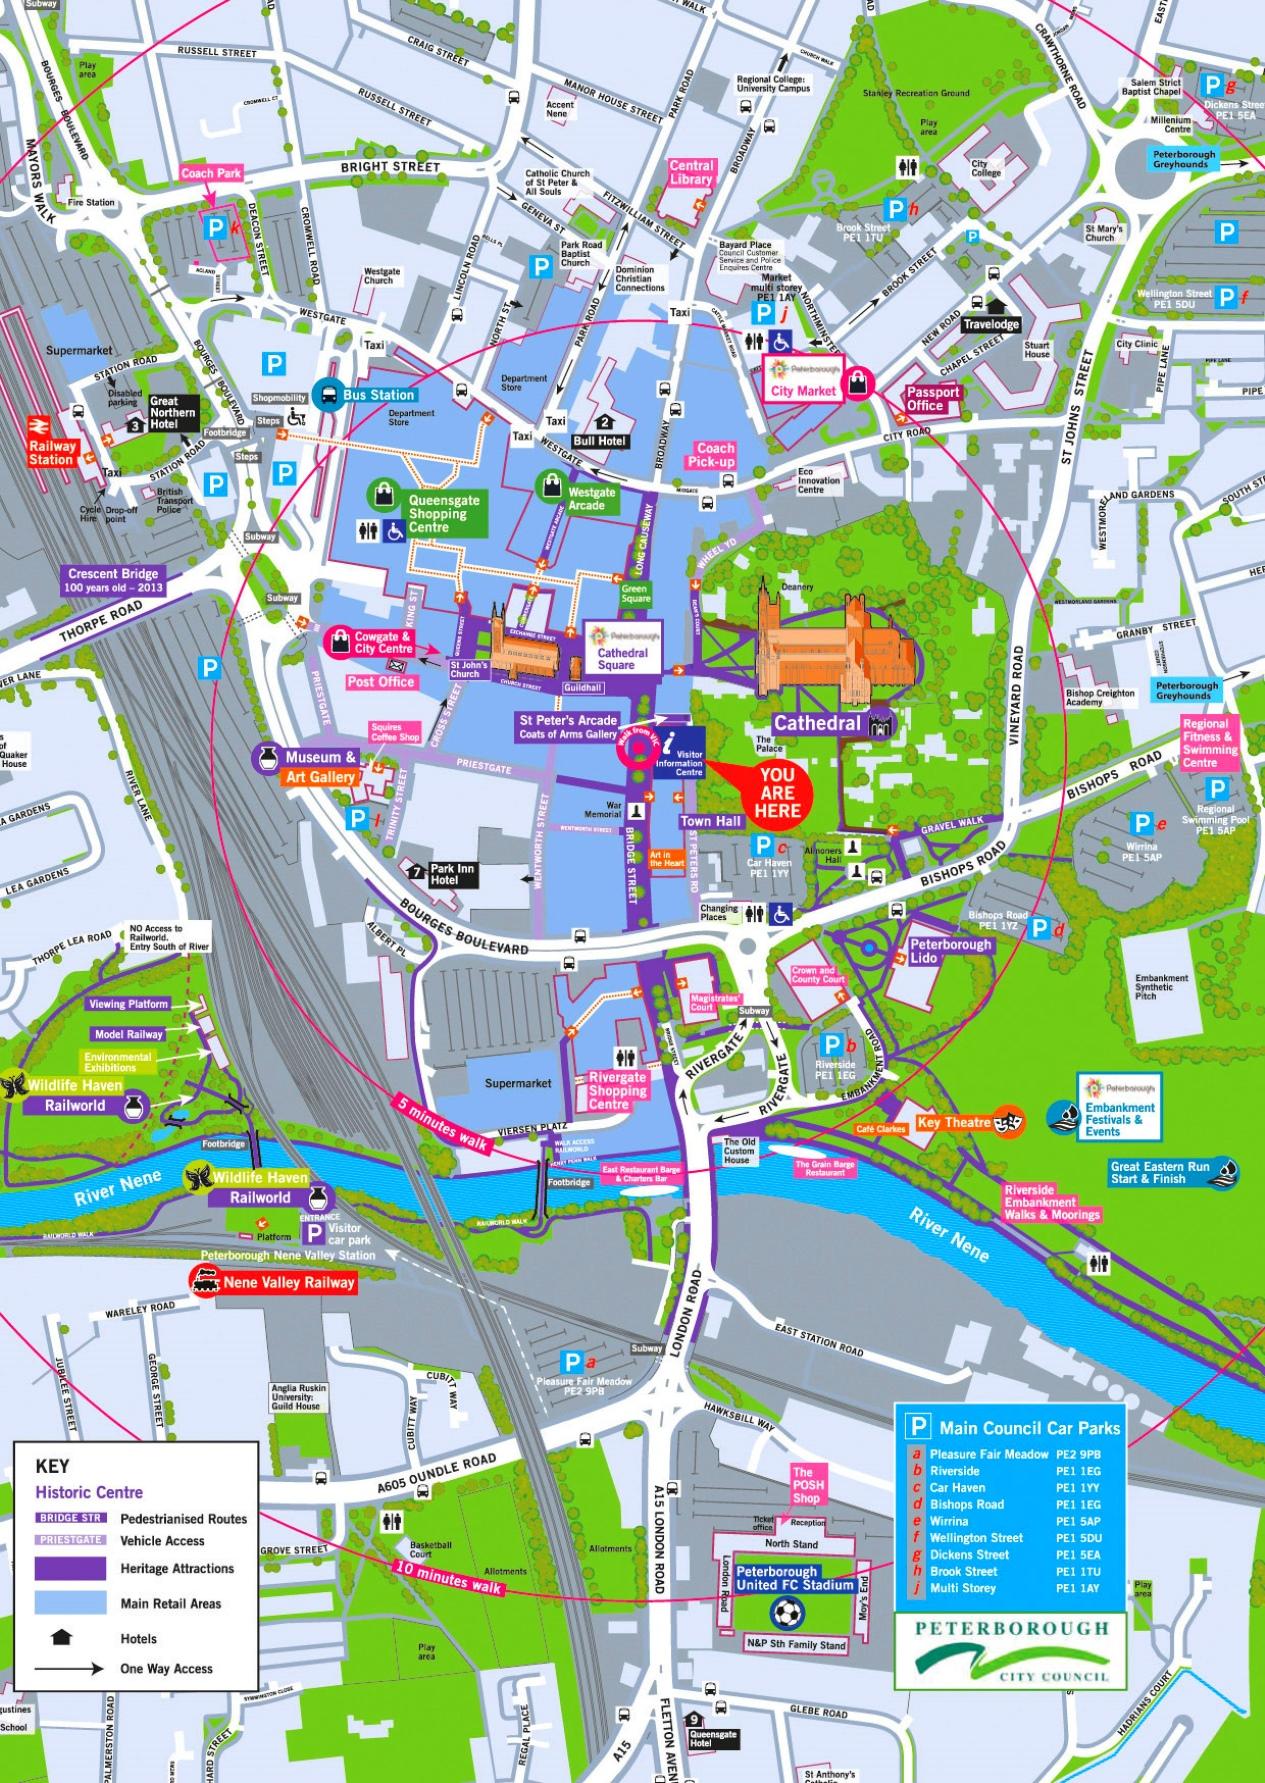 Peterborough Uk World Map